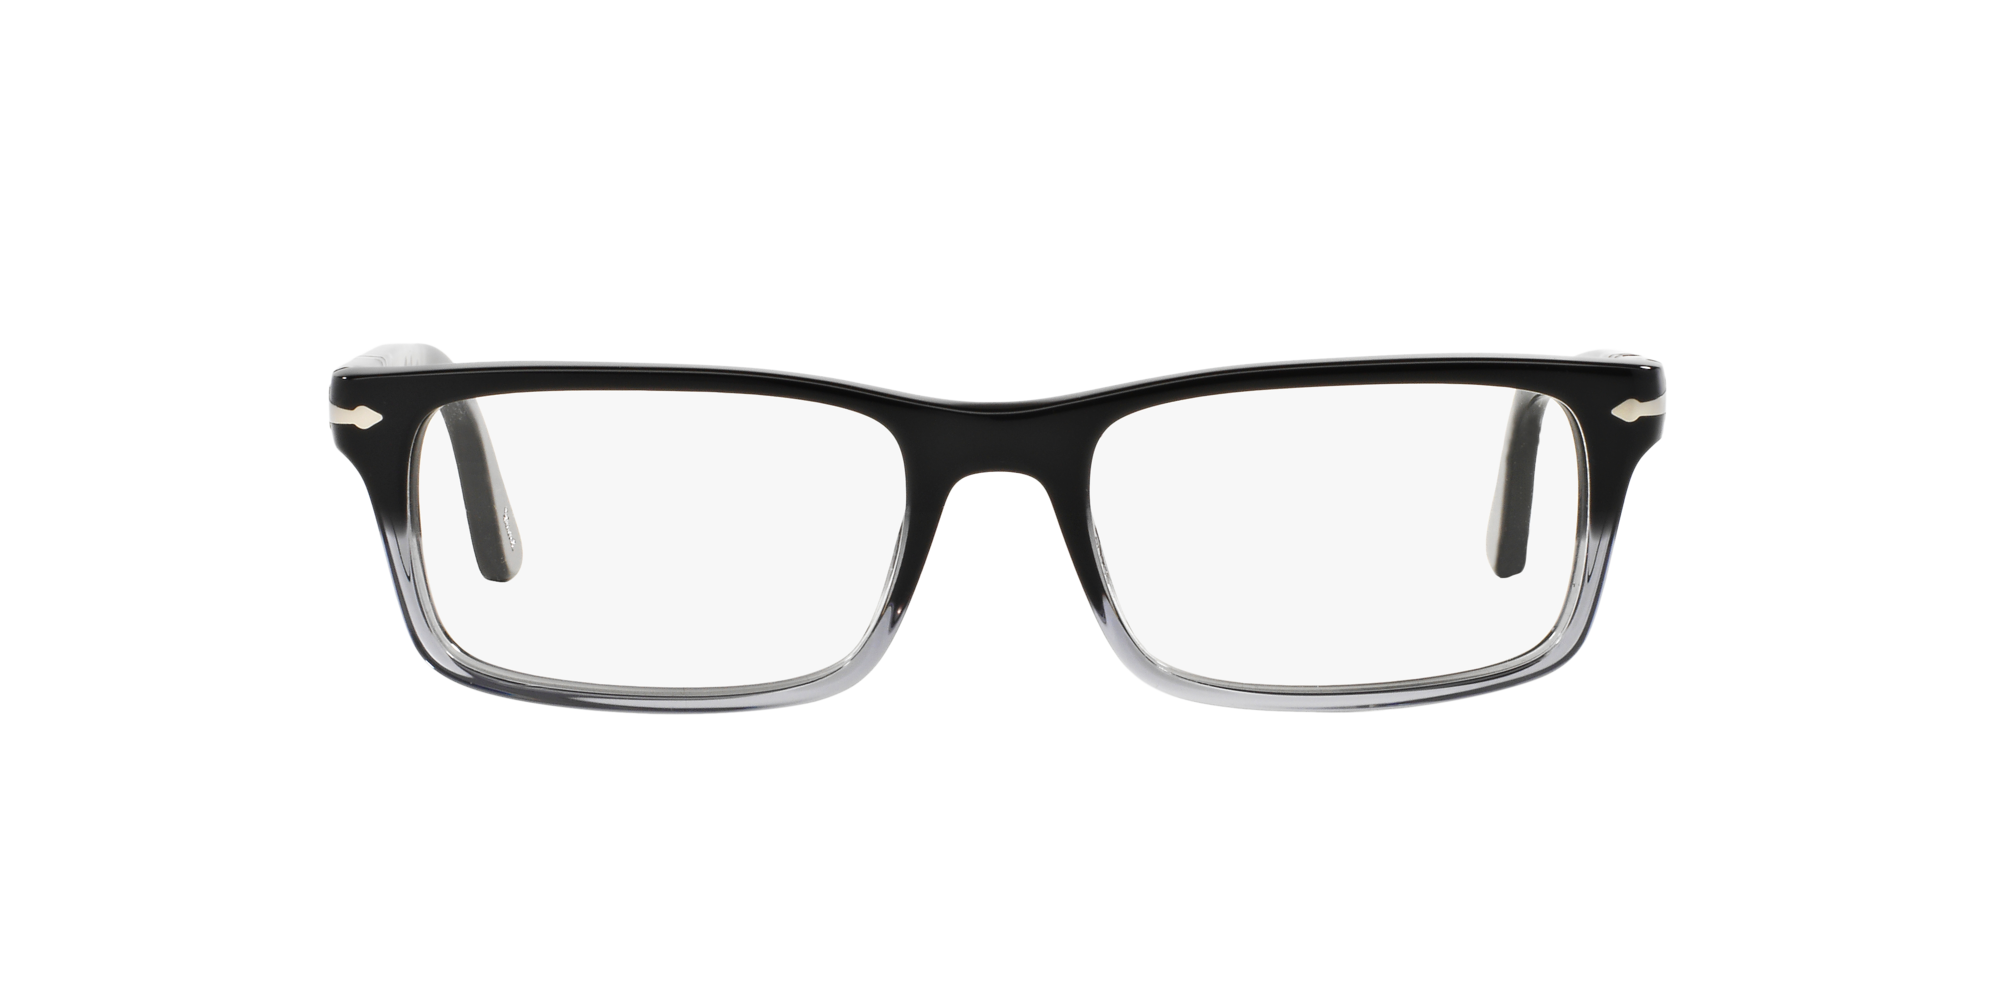 Image for PO3050V from LensCrafters | Glasses, Prescription Glasses Online, Eyewear